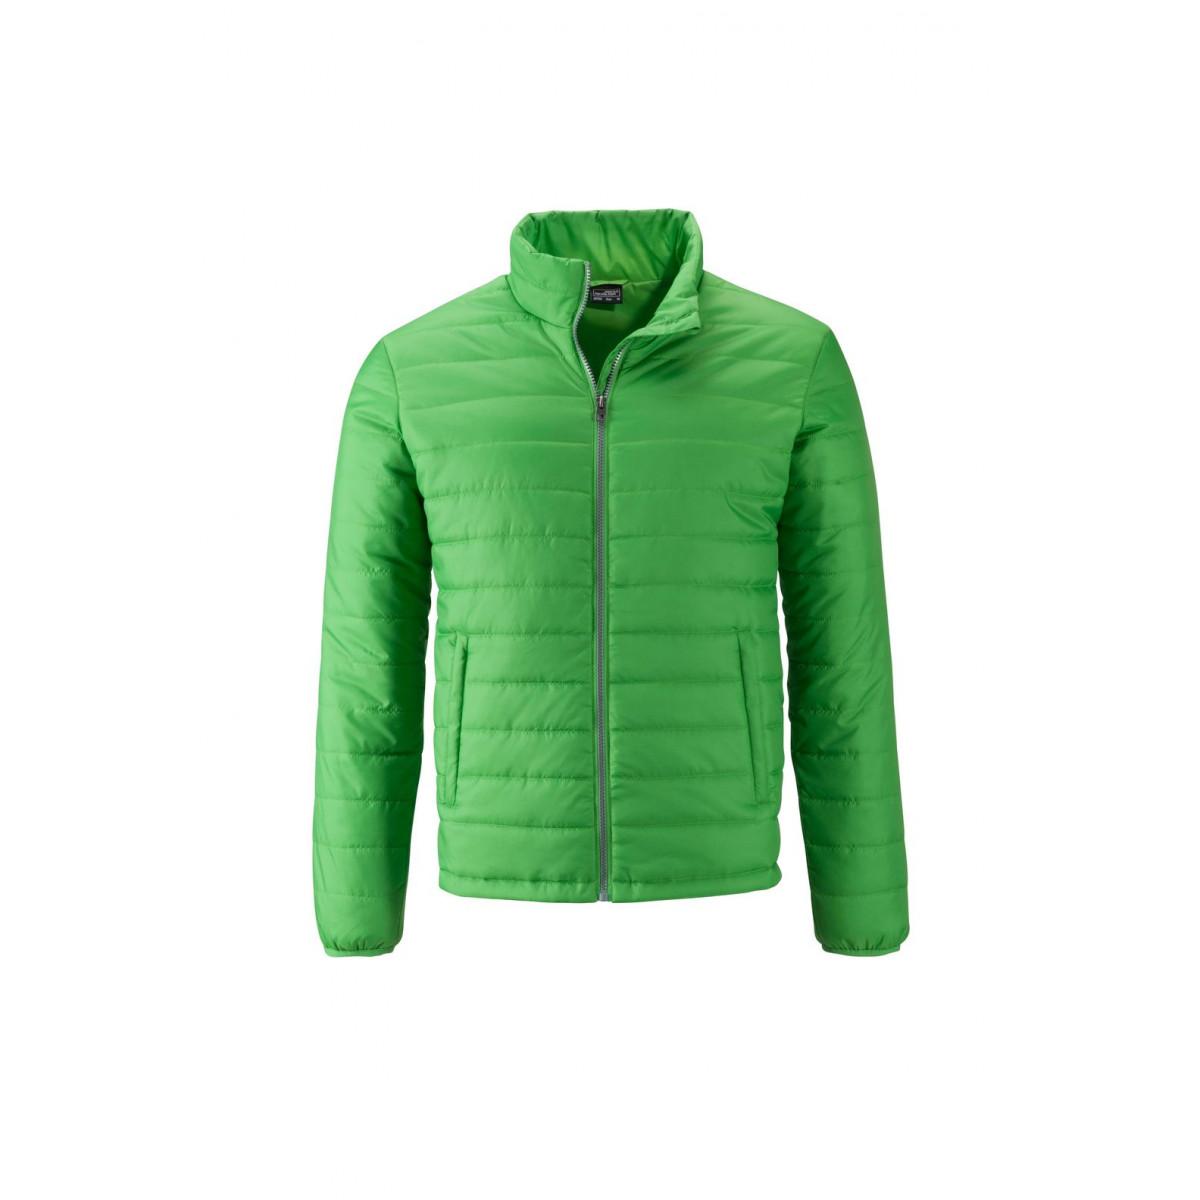 Куртка мужская JN1120 Mens Padded Jacket - Насыщенный зеленый